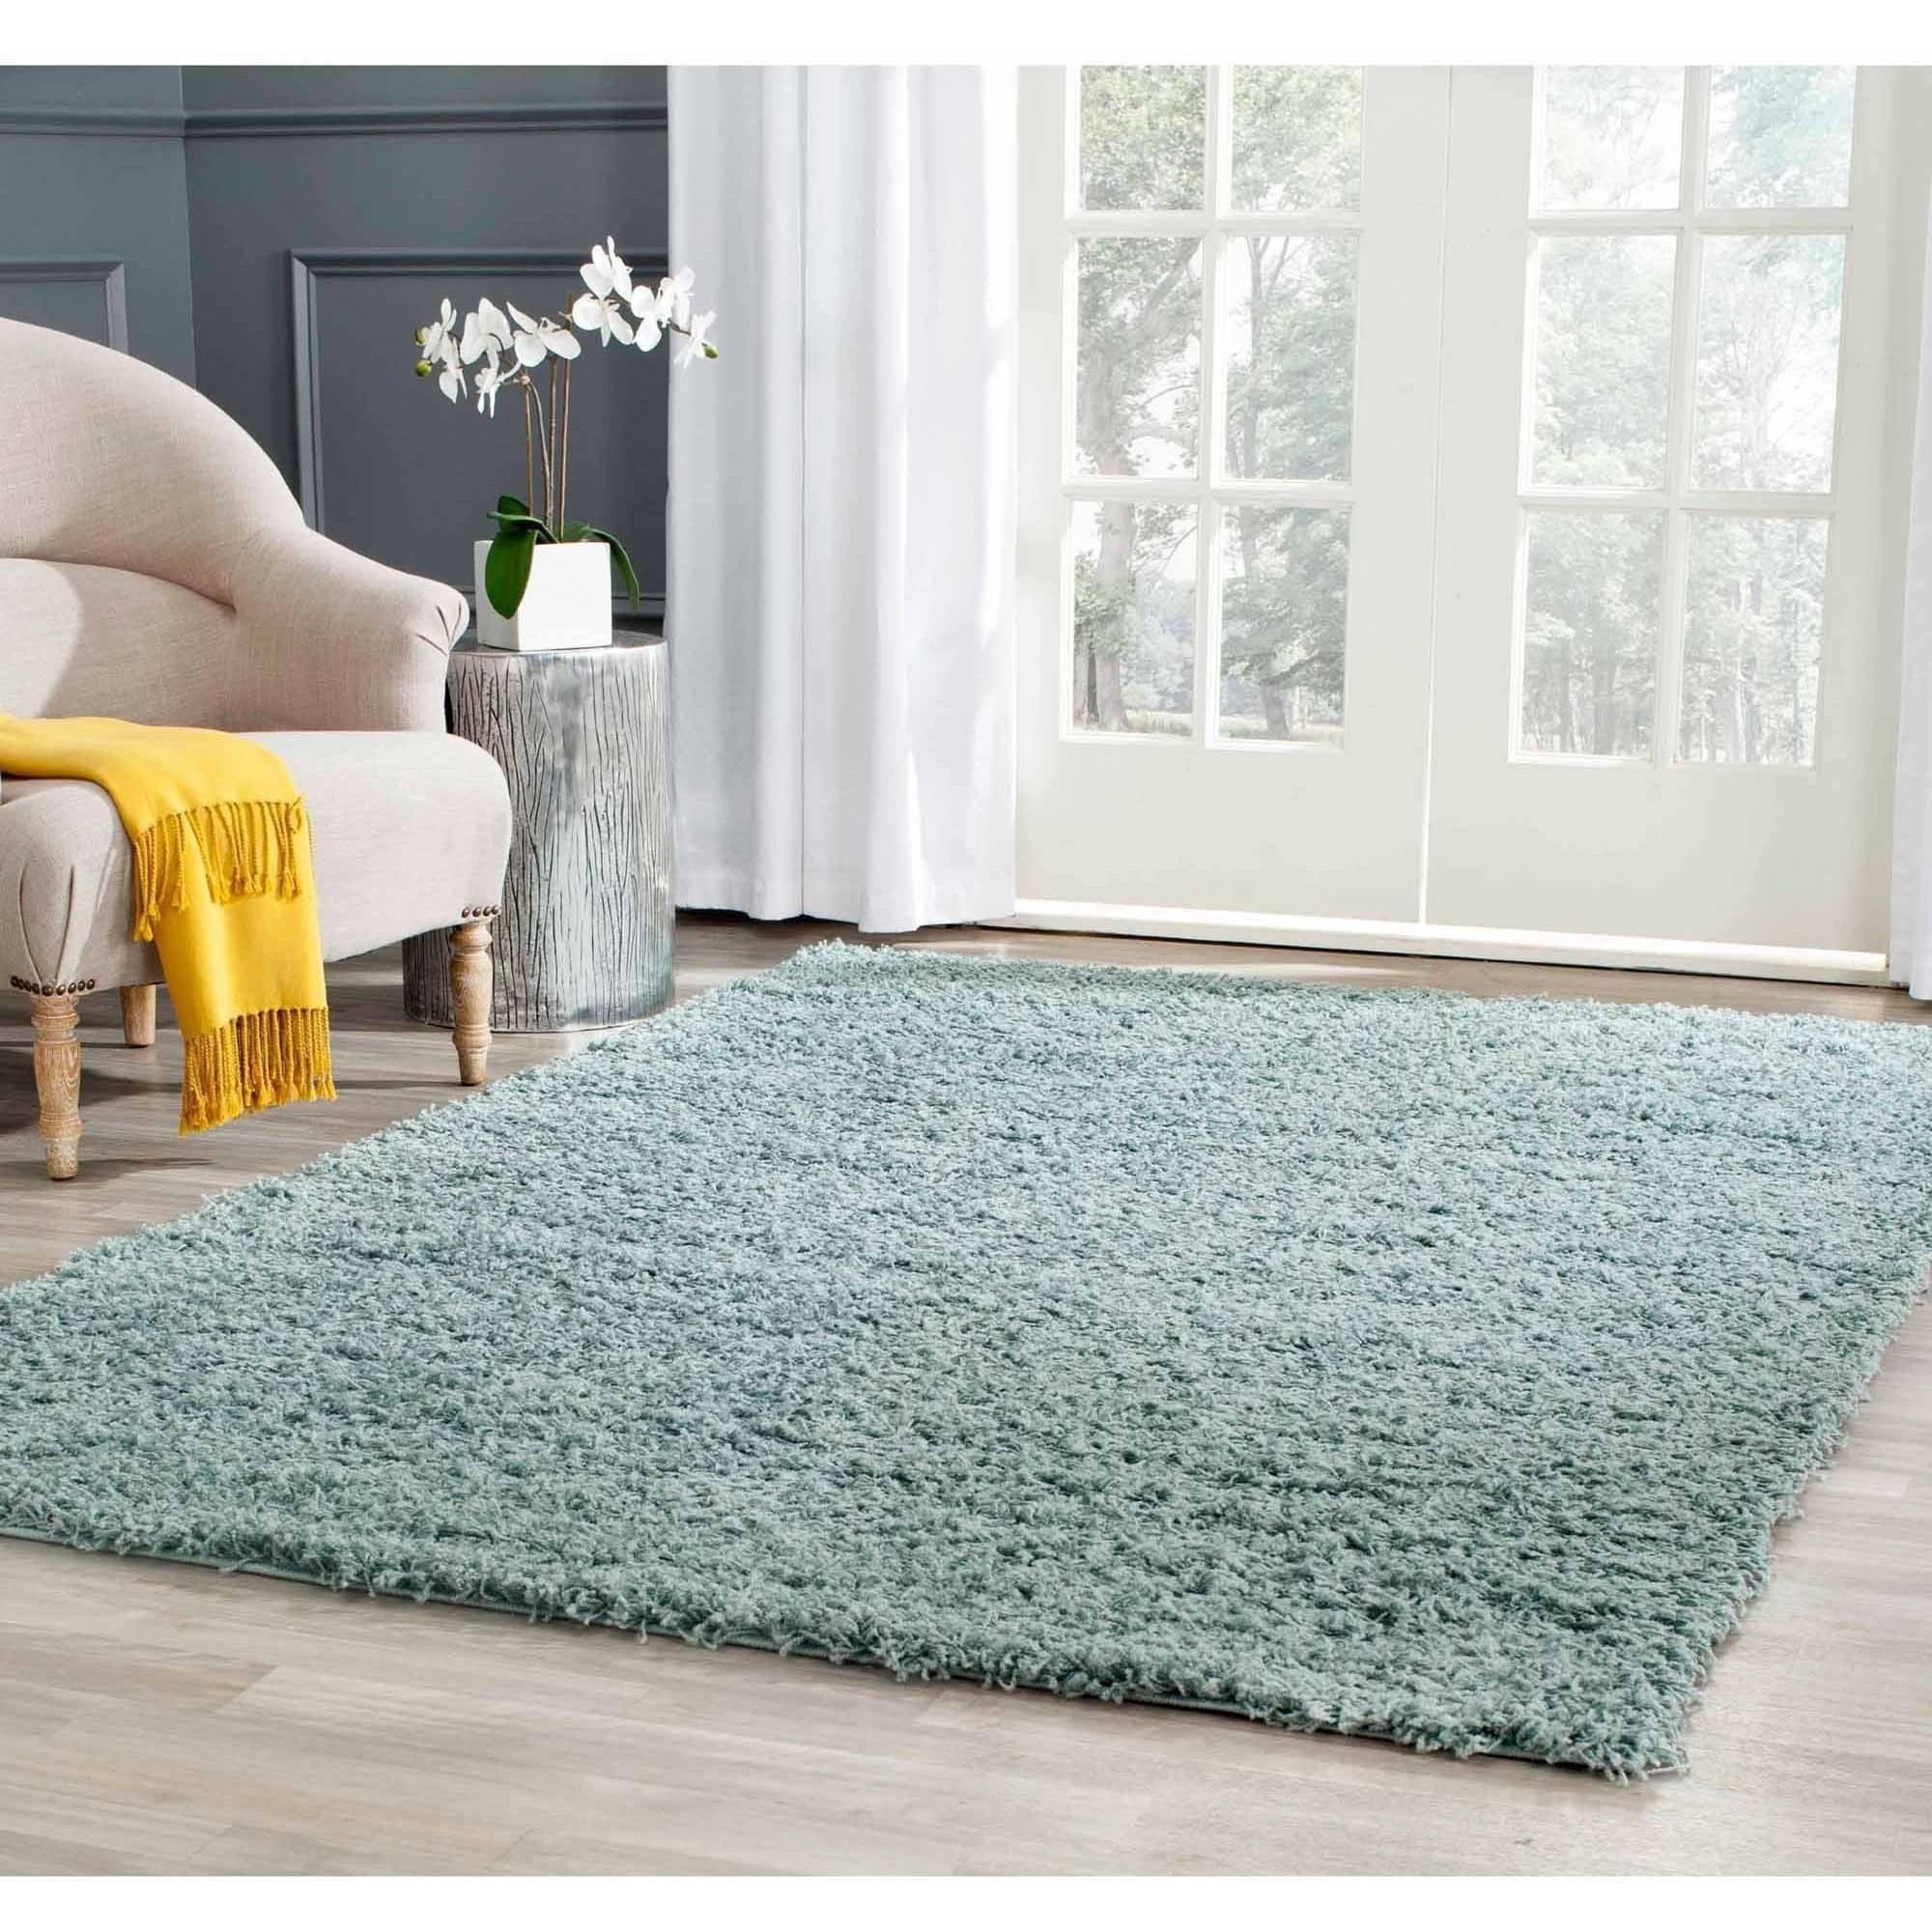 Shag Area Rugs safavieh athens power-loomed shag area rug available in multiple